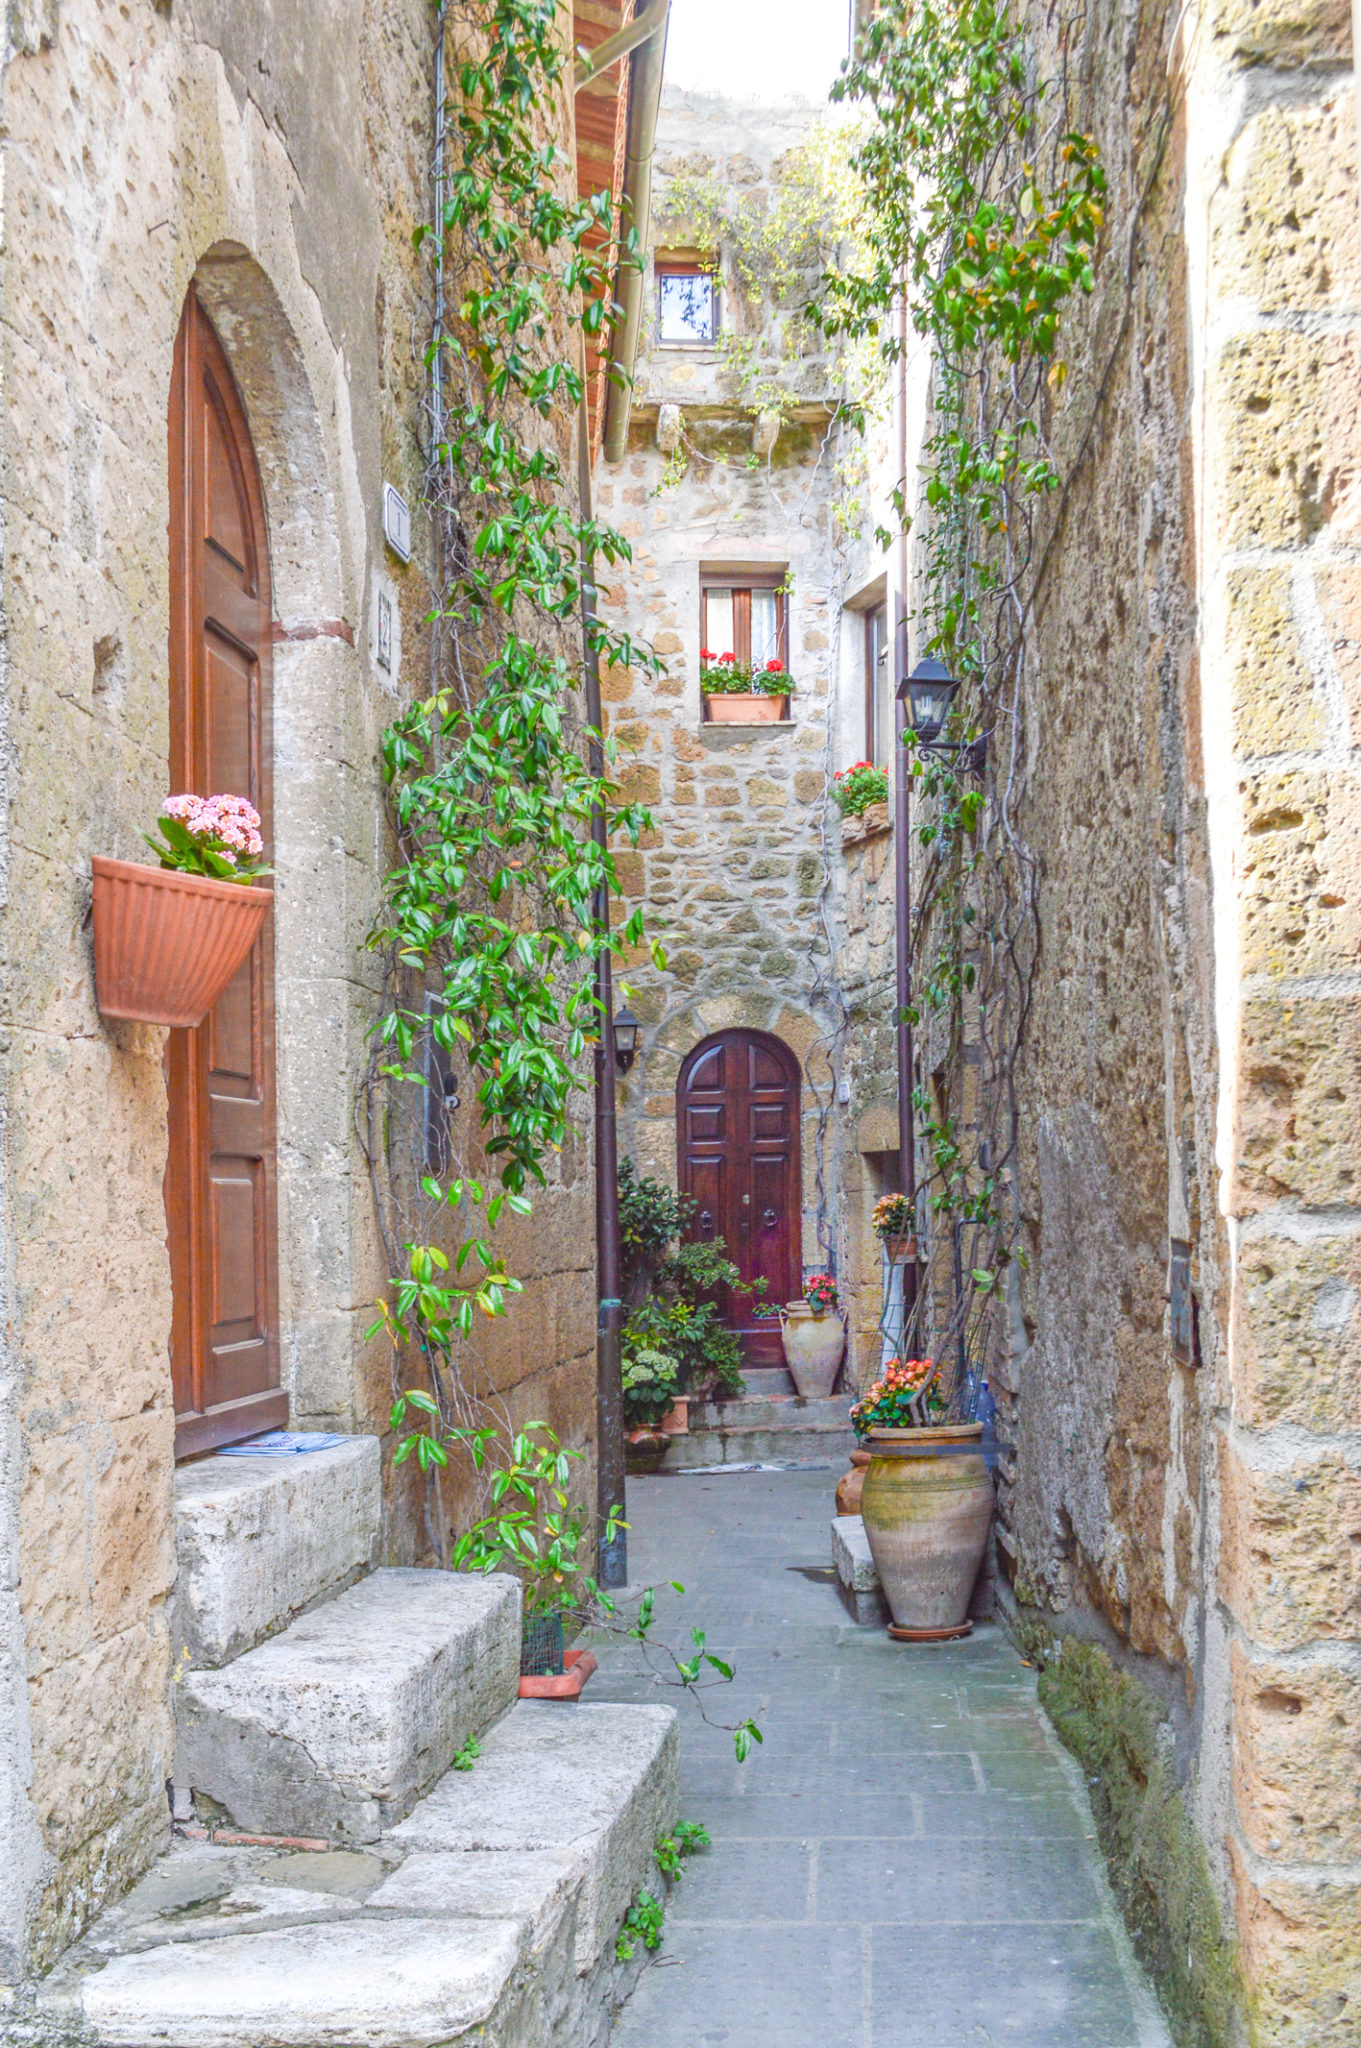 161 #WhereToGo: Pitigliano (Toscana)